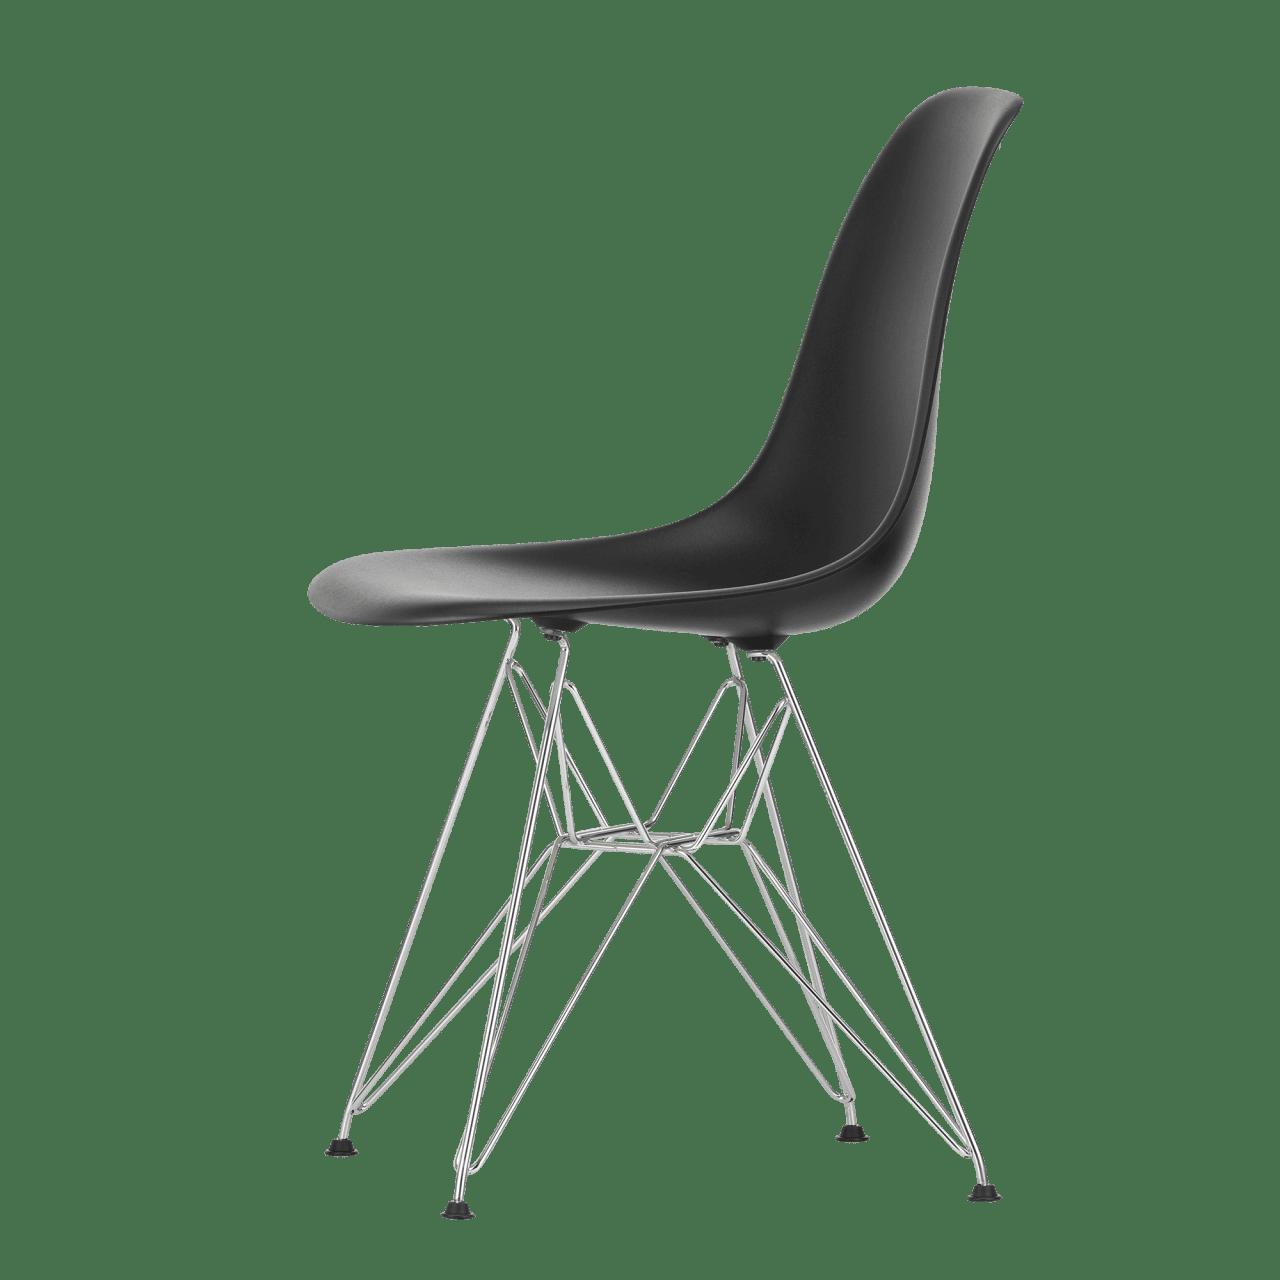 Eames Plastic Sidechair DSR